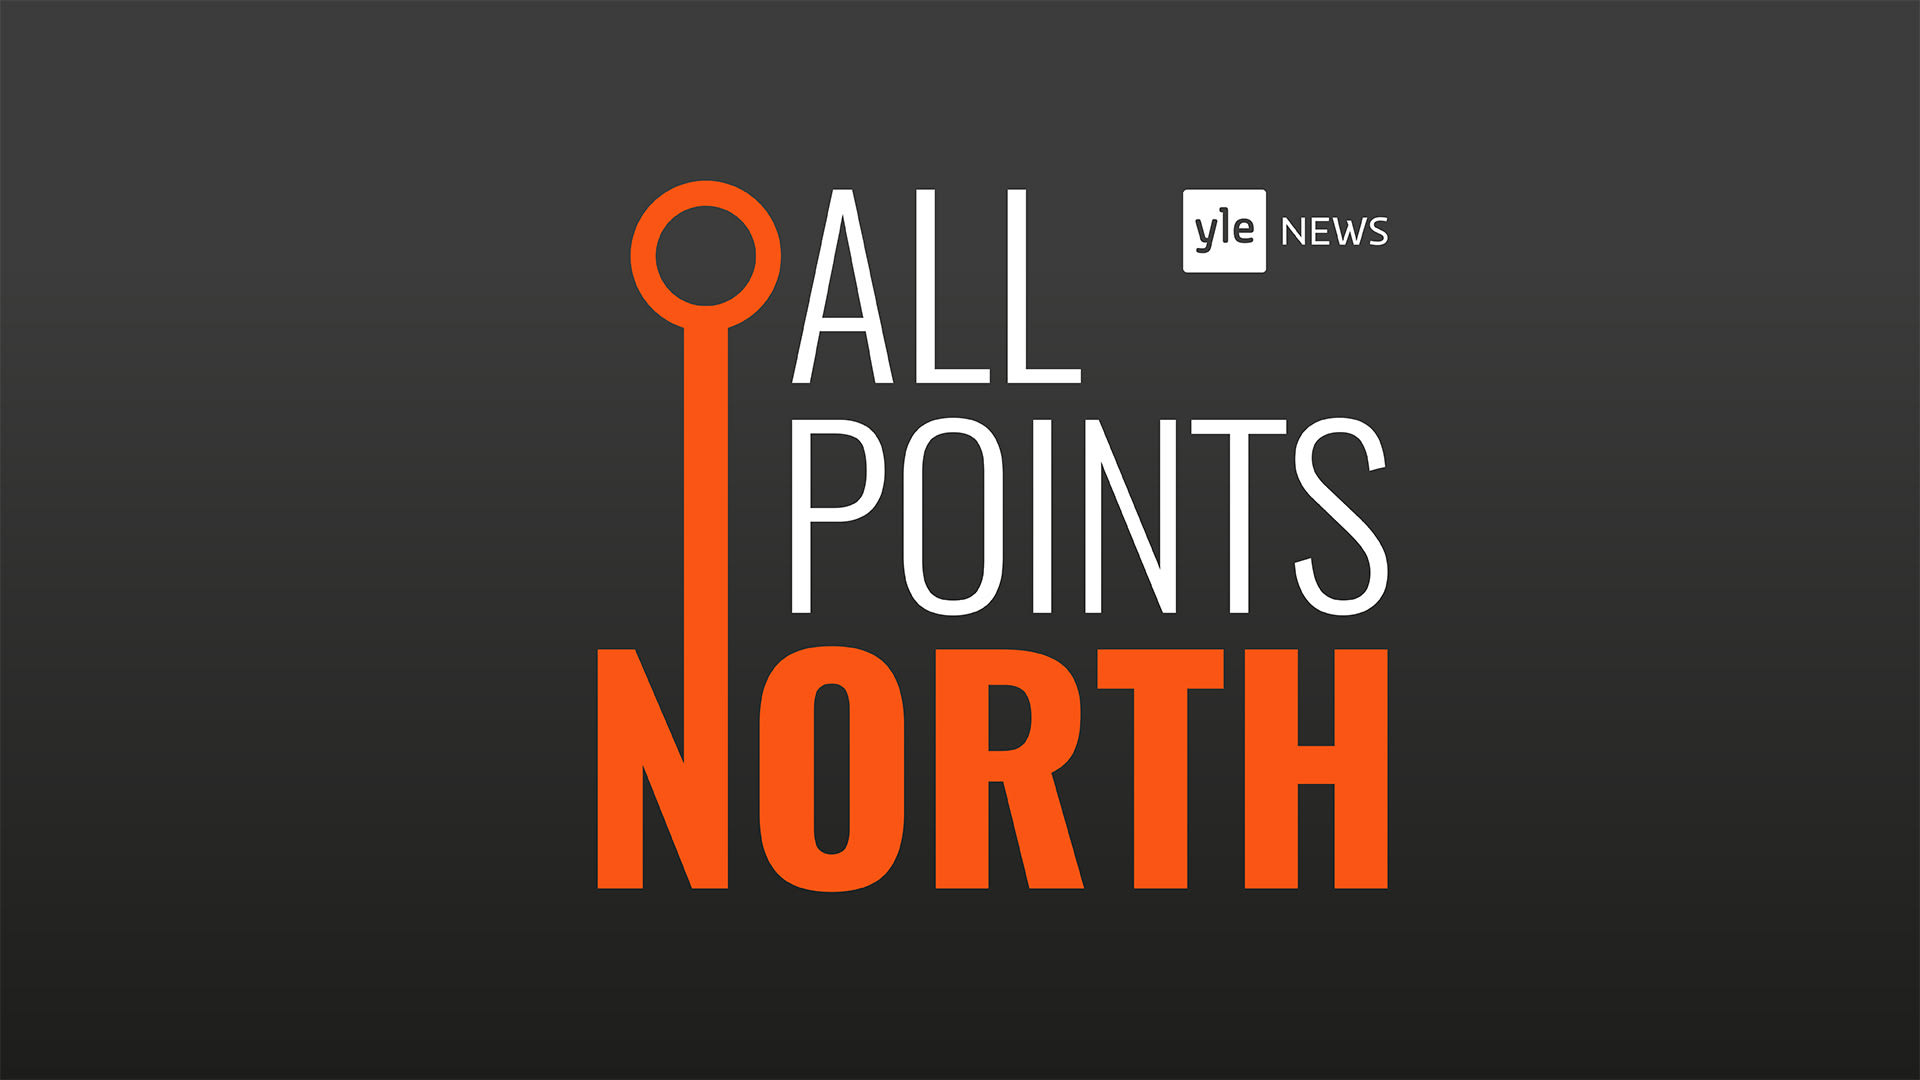 All Points North | Tiina Ristikari and Elina Marjamäki on young people's mental health